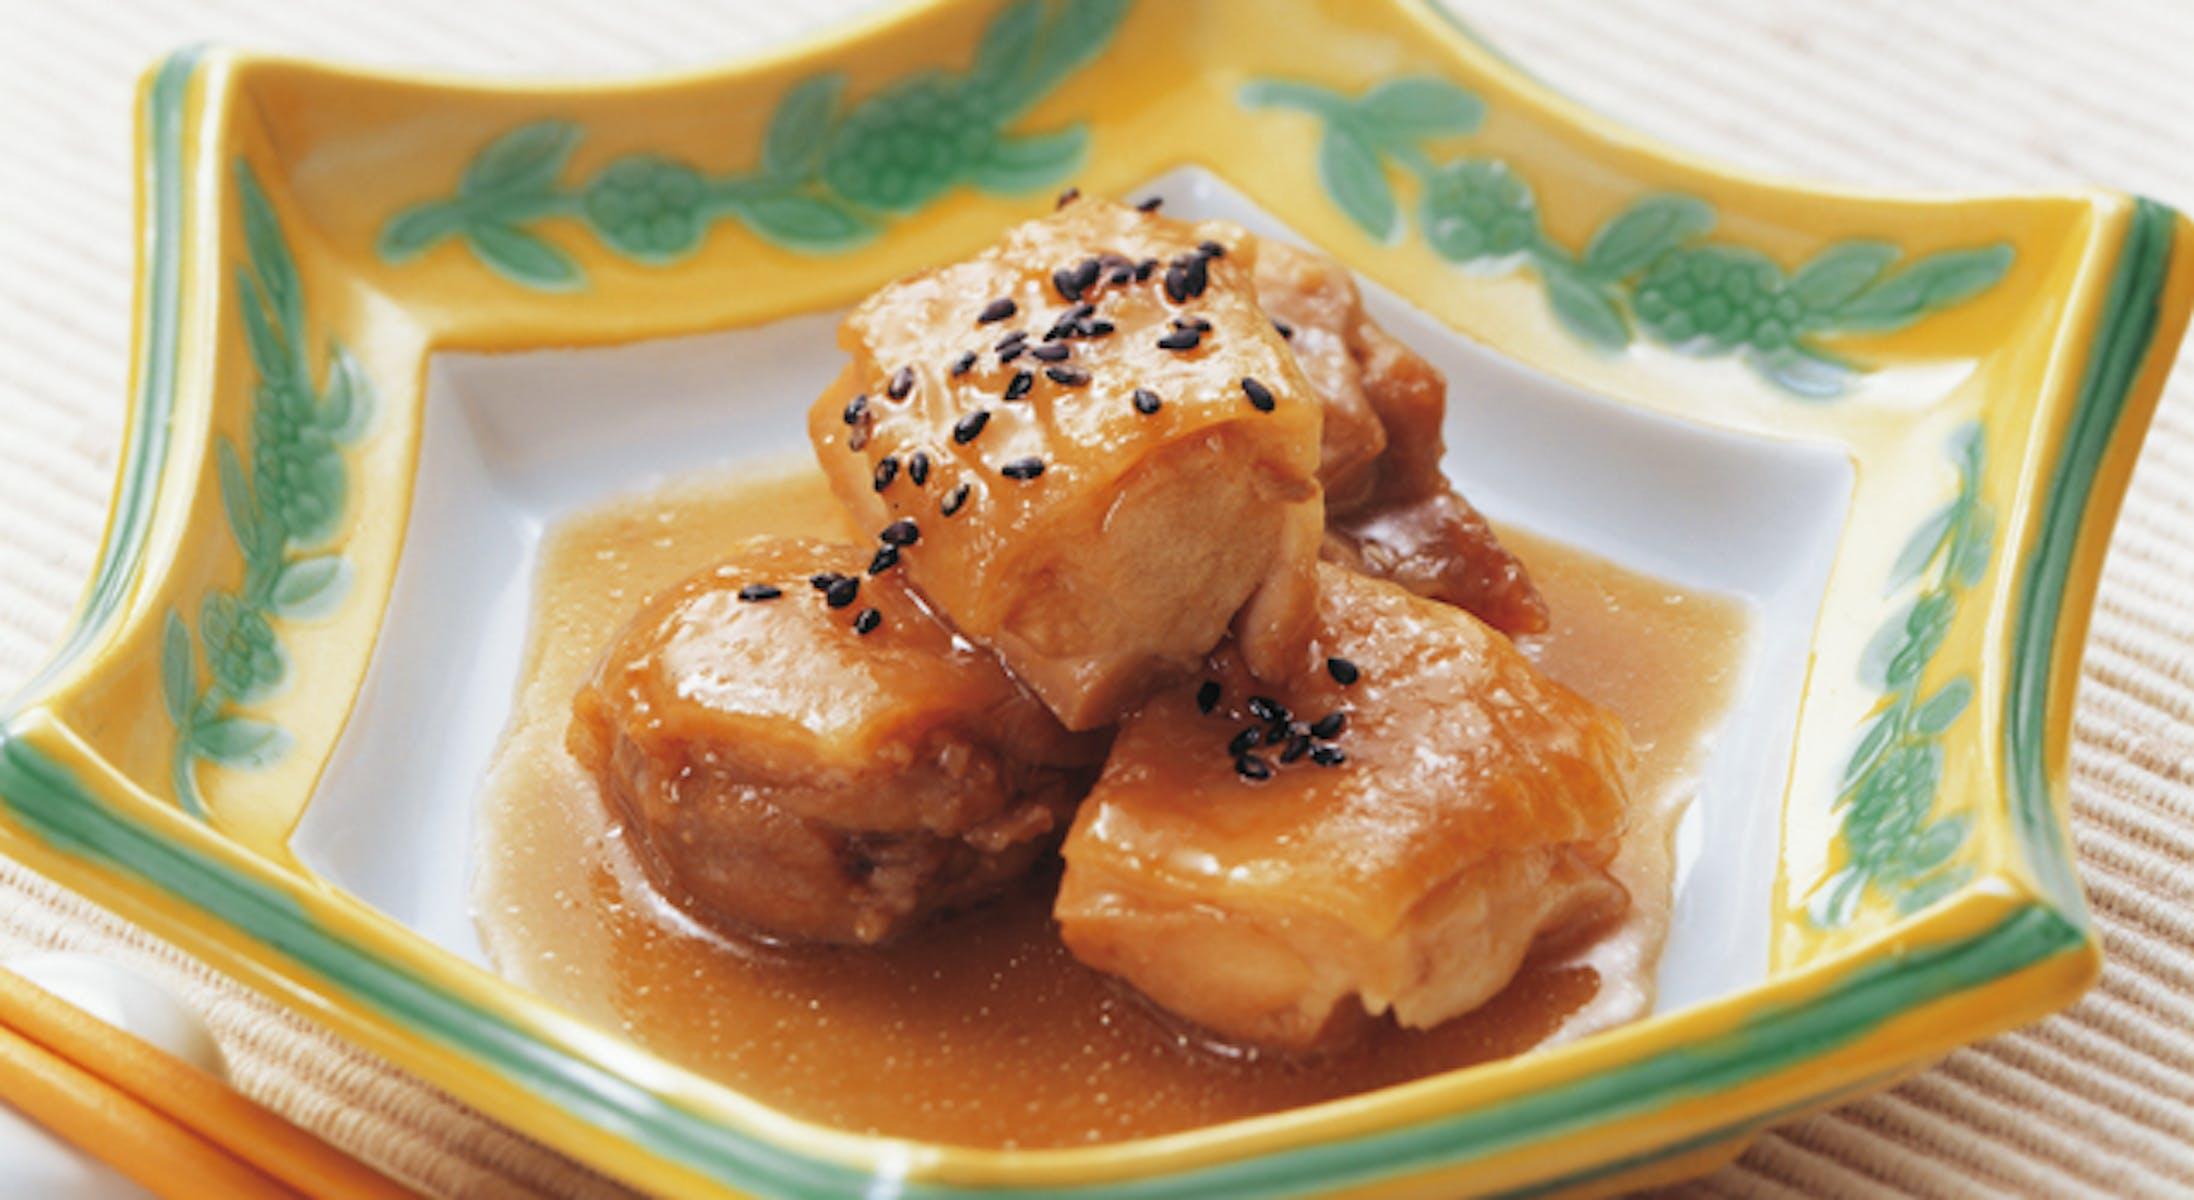 鶏肉の甘辛酒煮